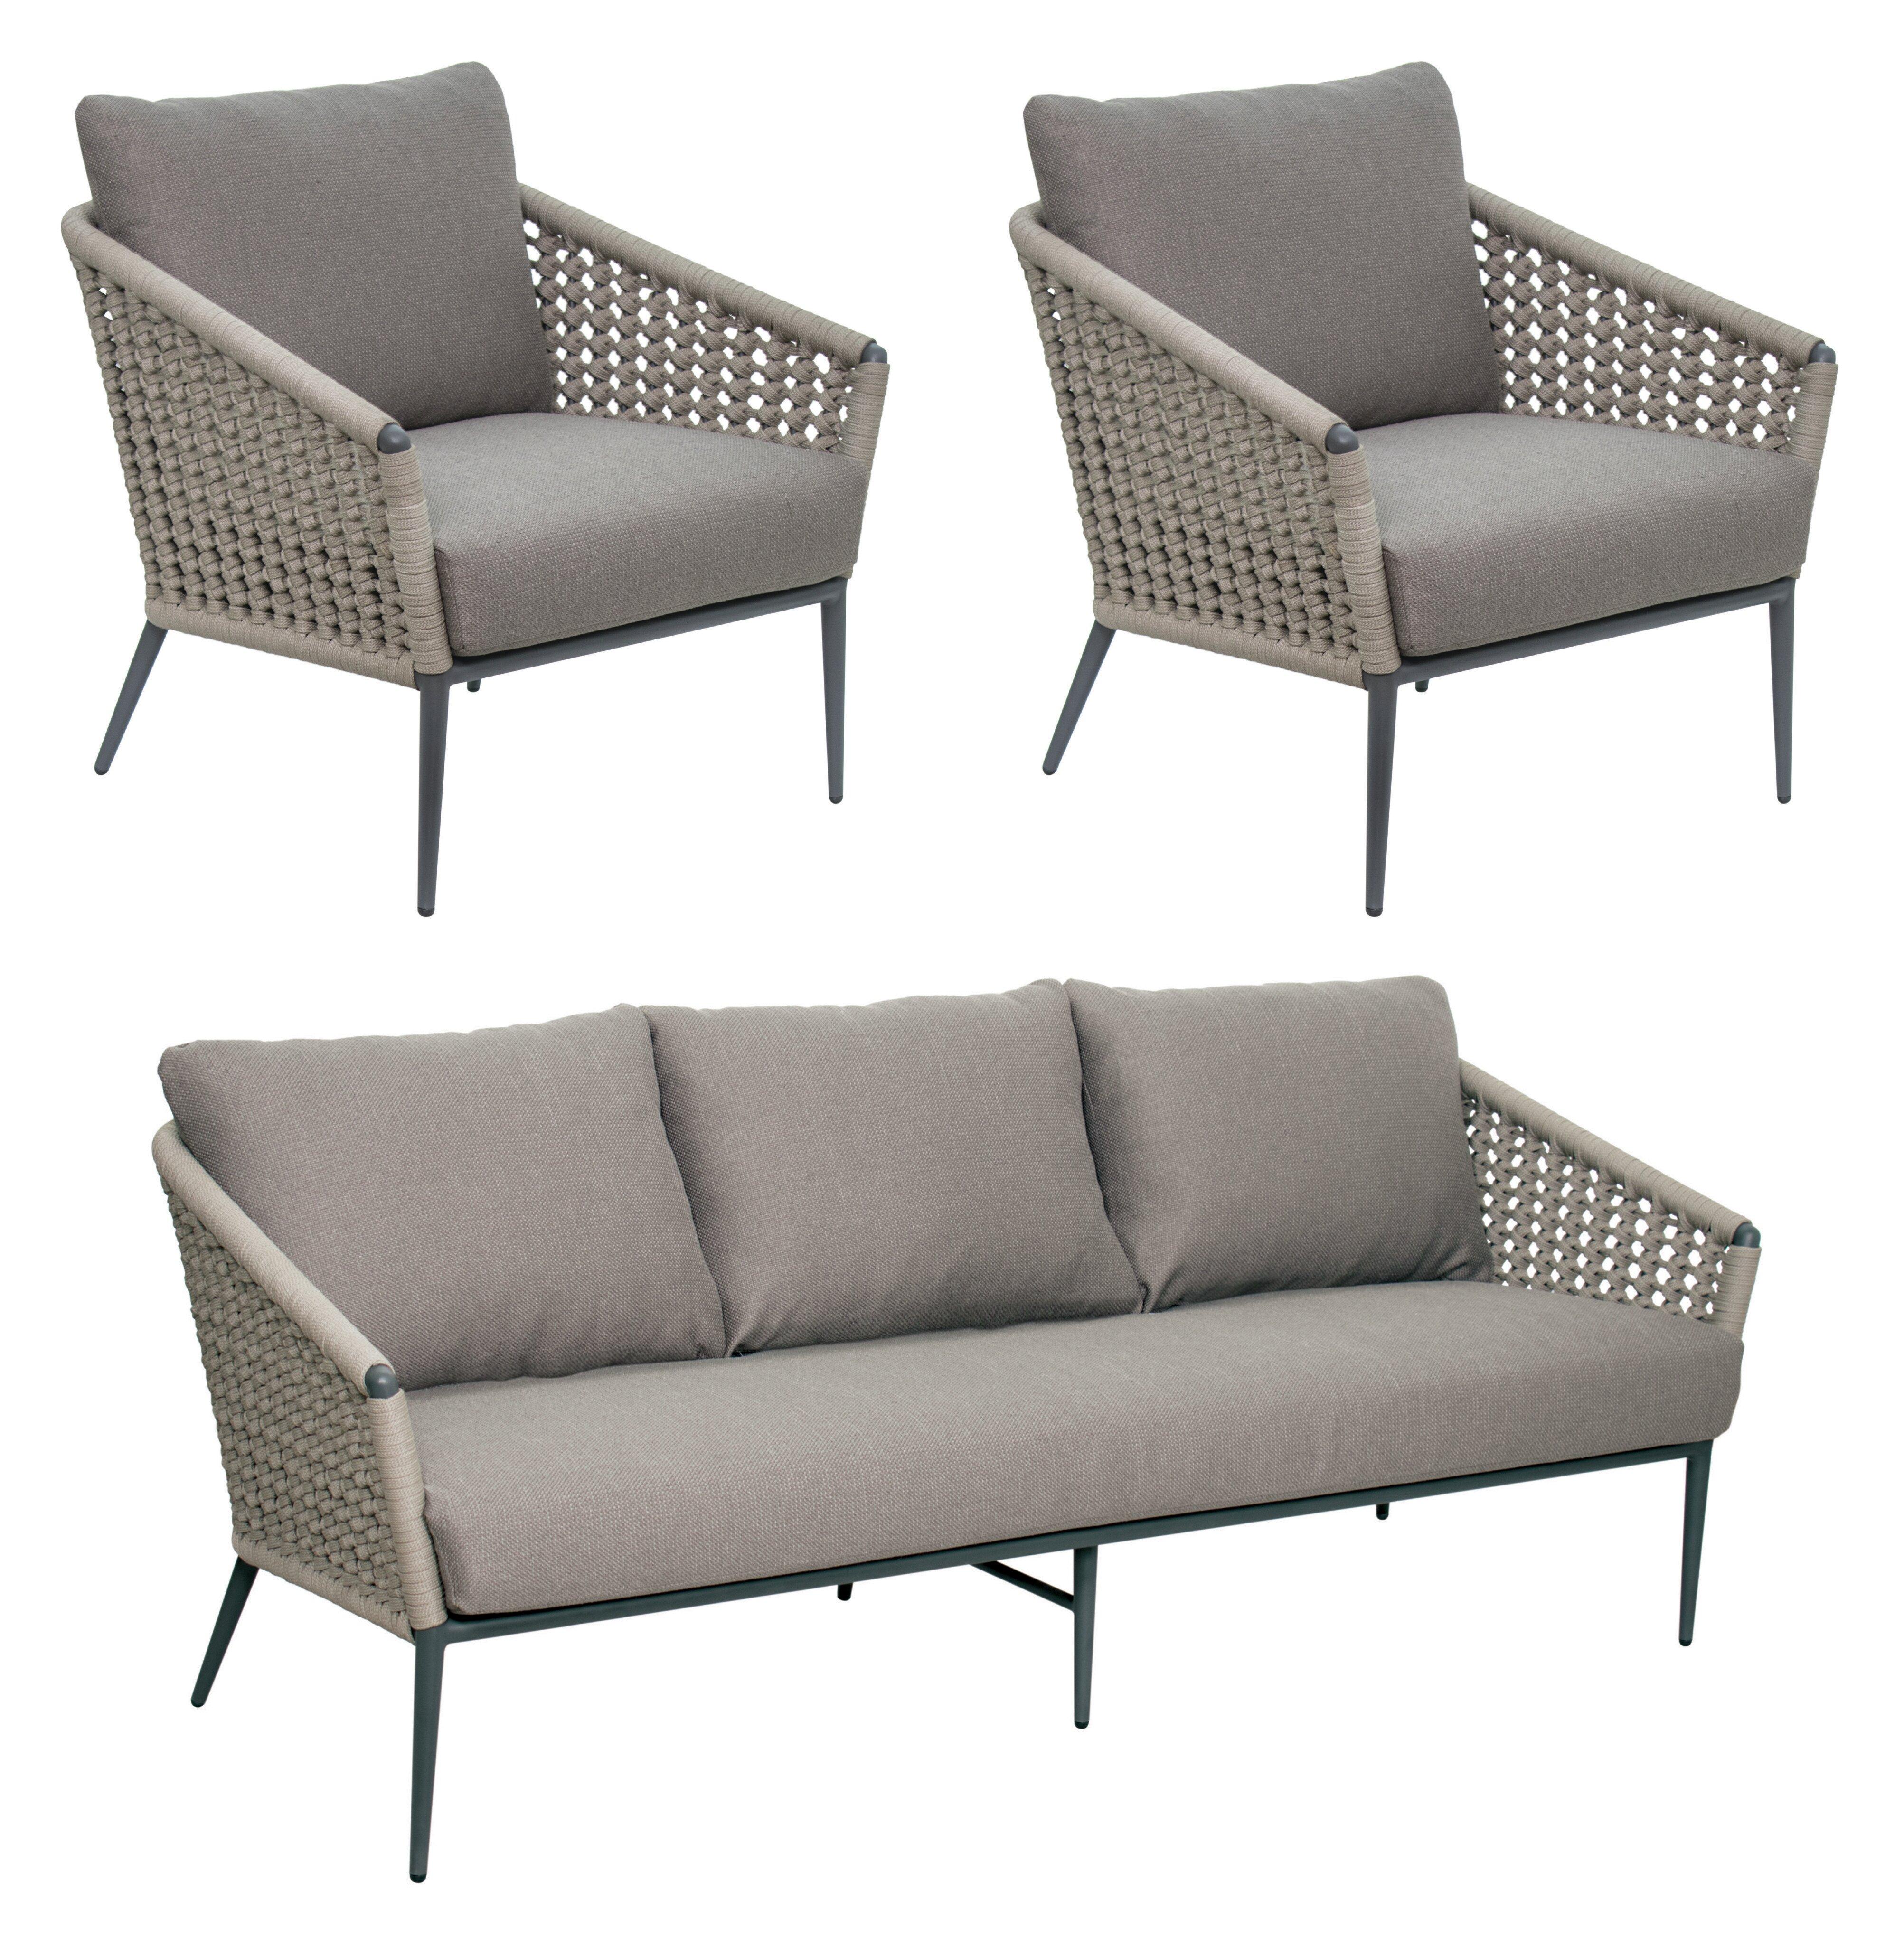 Seasonalliving Archipelago Antilles 3 Piece Rattan Sofa Seating Group With Cushions Perigold